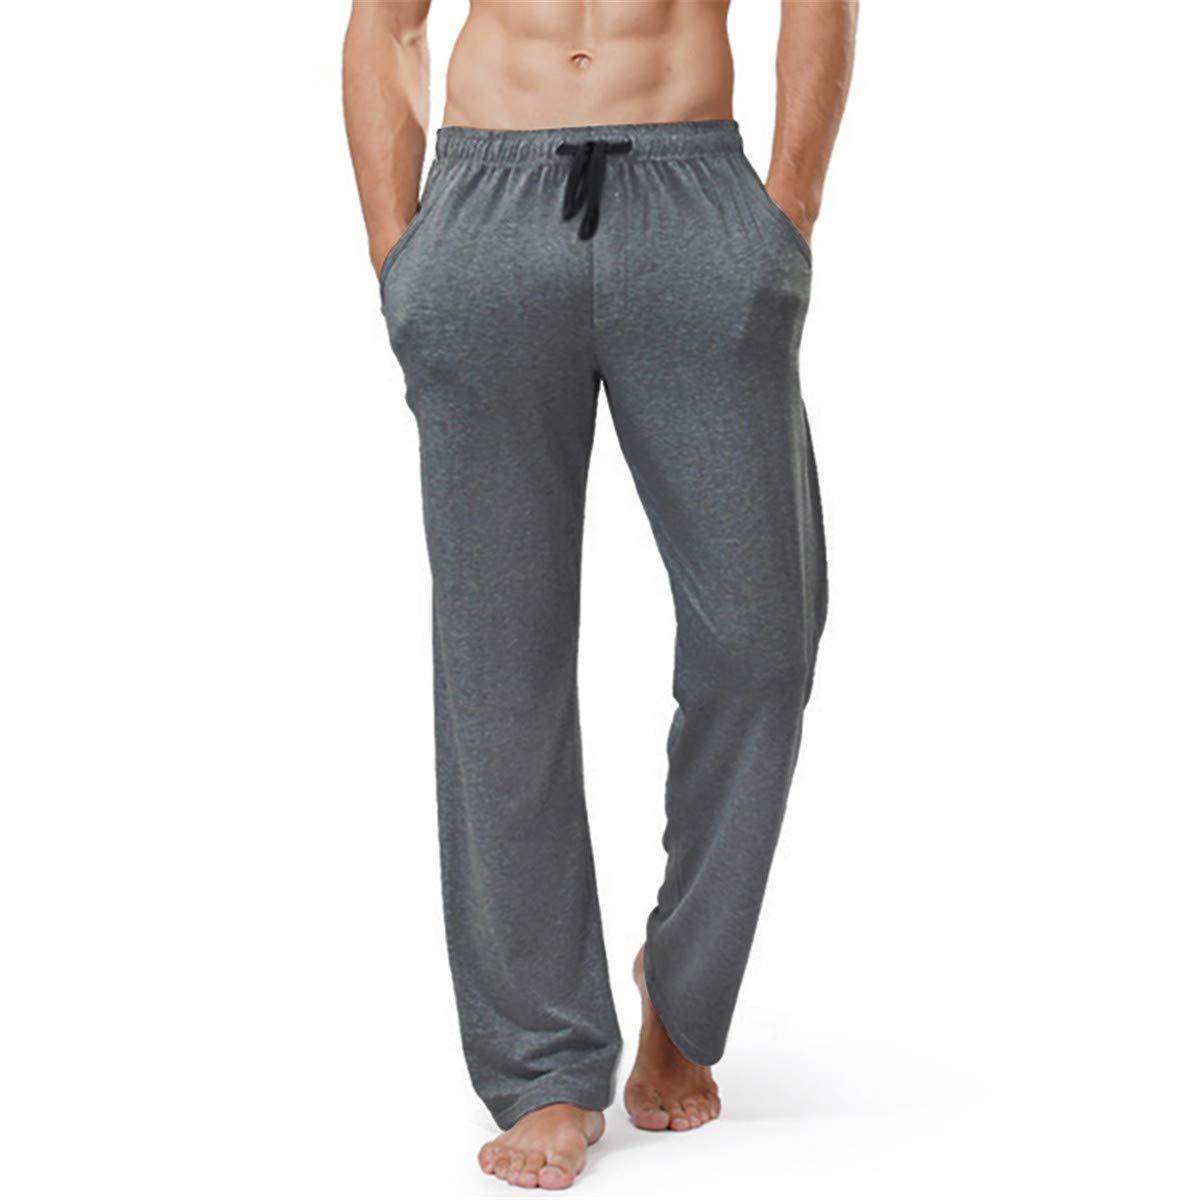 Leroyca Plus Size Homewear Mens Cotton Sleep Bottoms Man String Loose Pijamas Pants Male Solid Breathable Color Lounge Pants